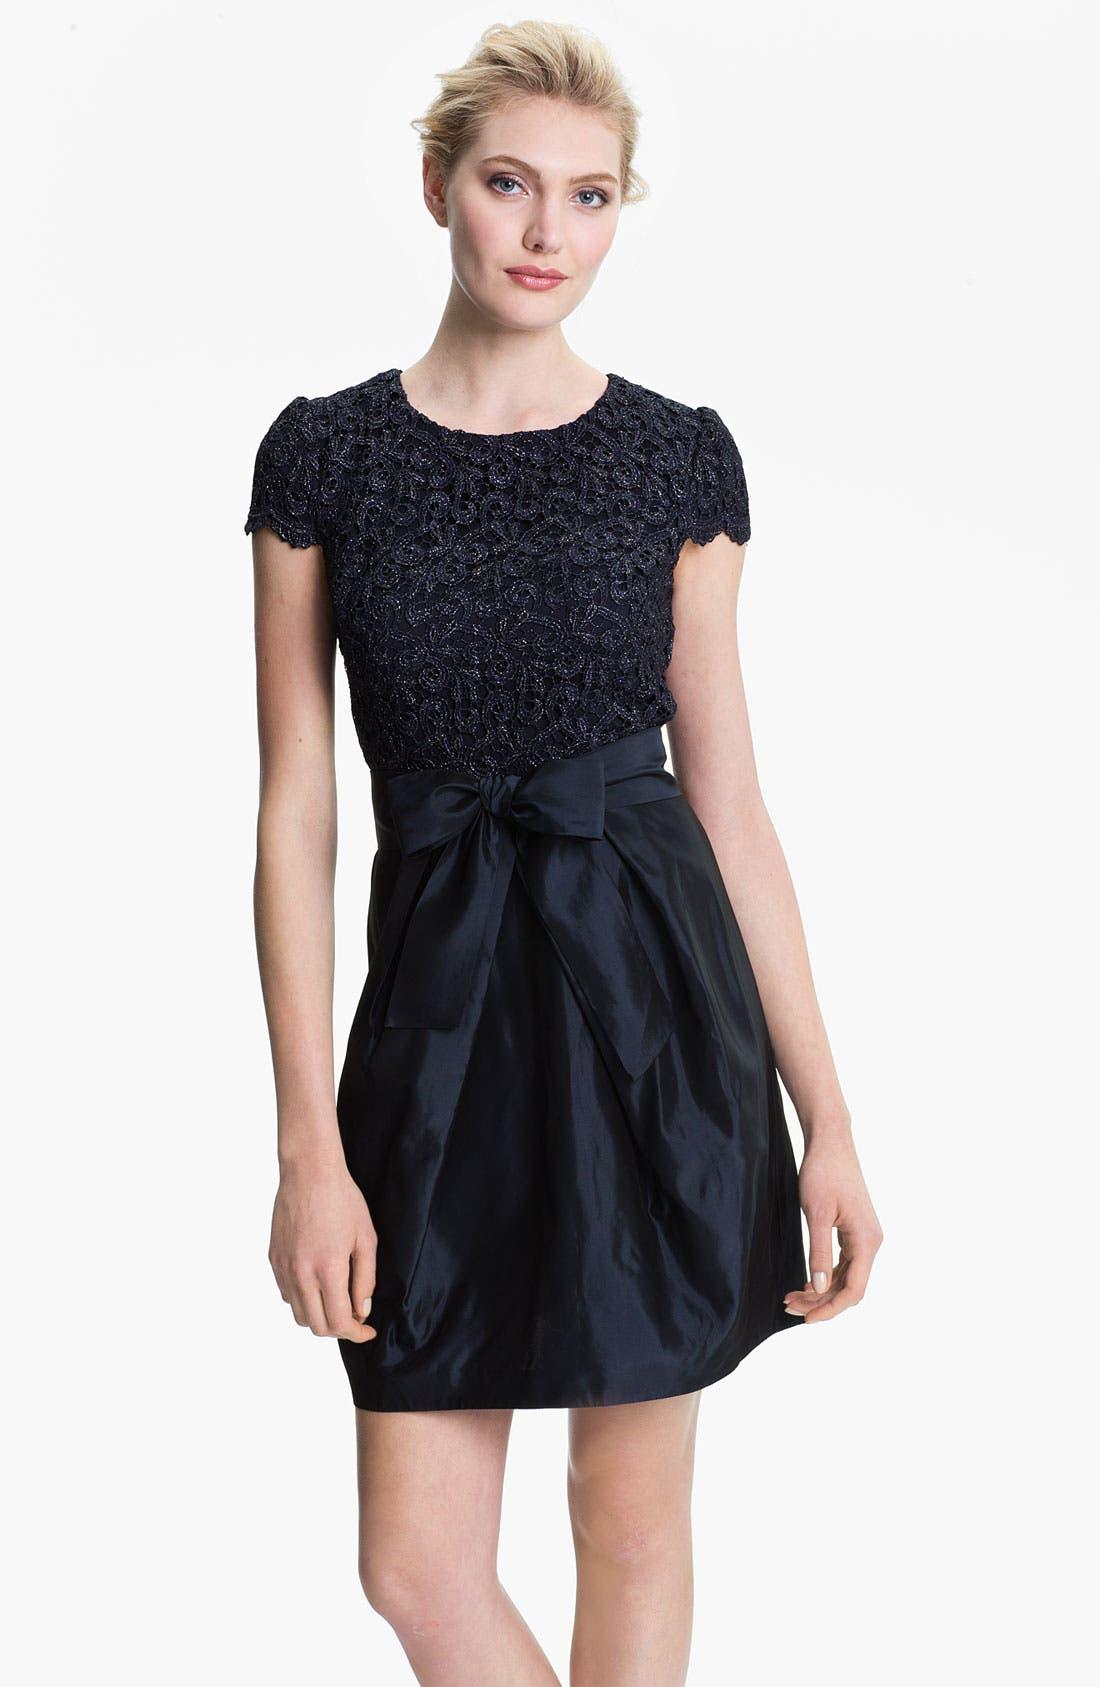 Alternate Image 1 Selected - Suzi Chin for Maggy Boutique Lace & Taffeta Dress